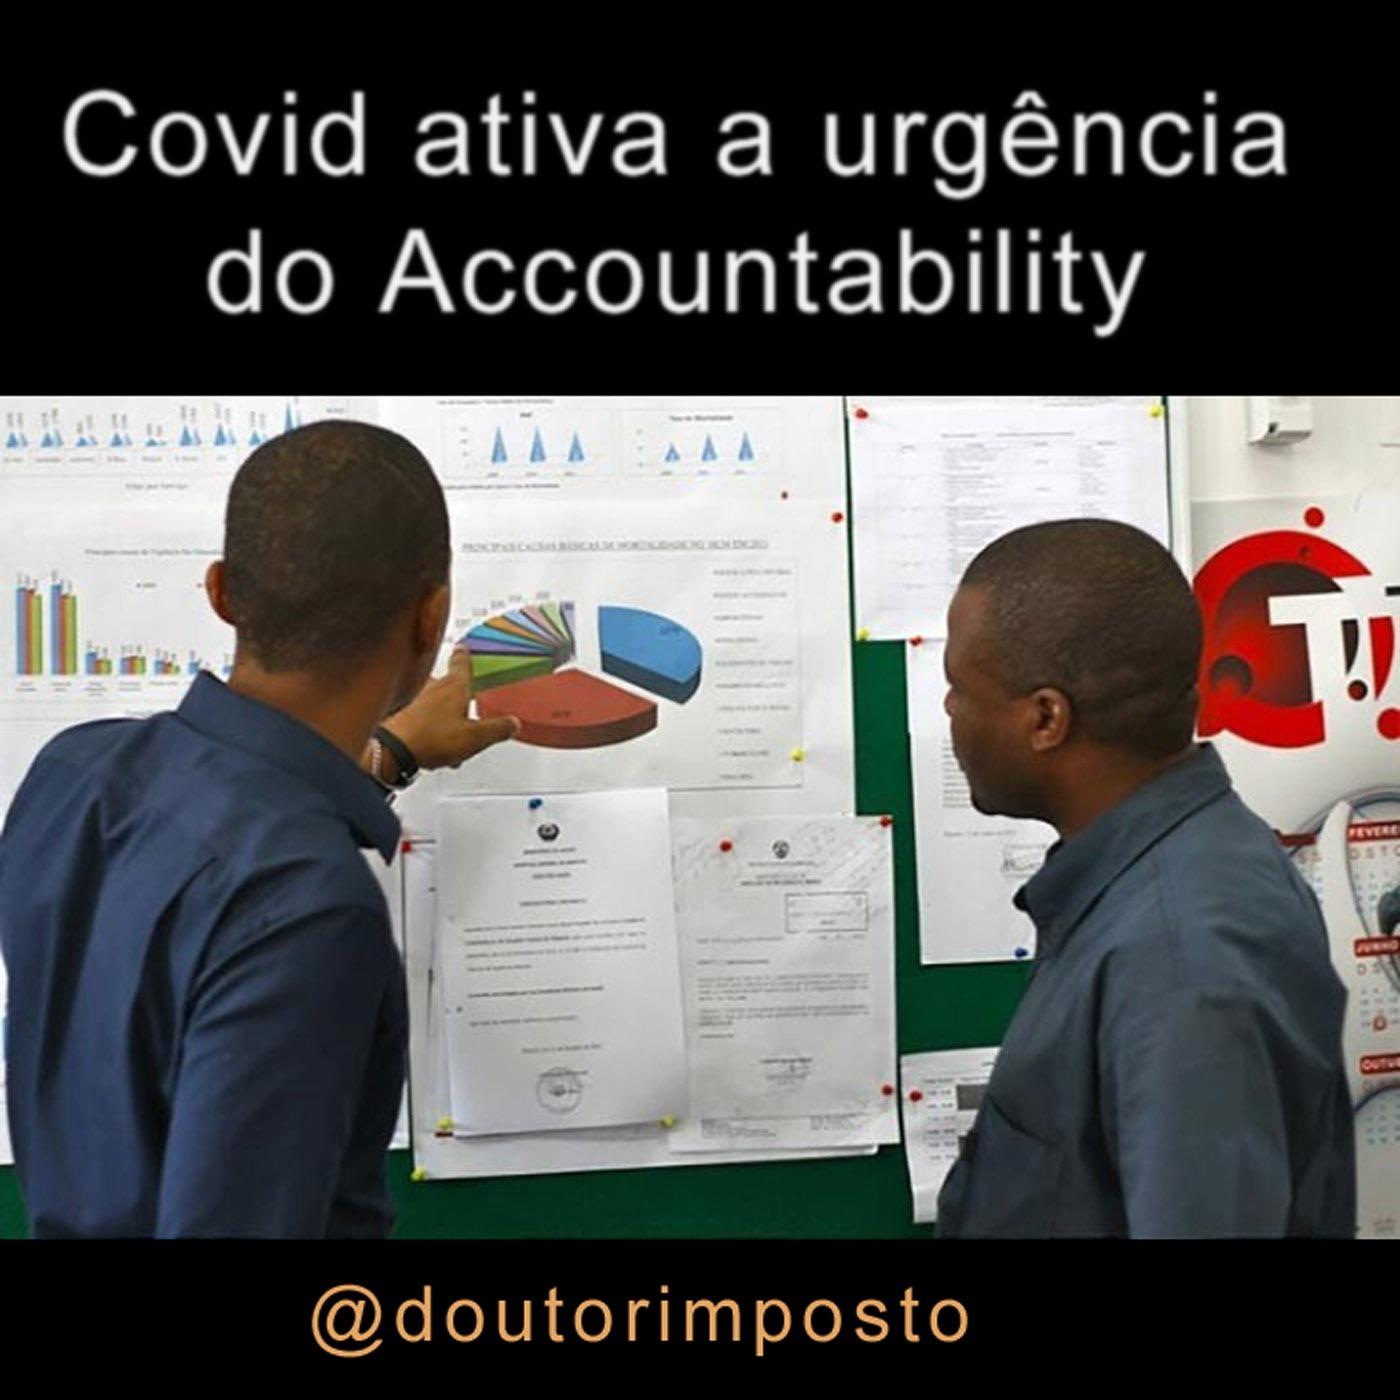 Covid Ativa a Urgência do Accountability 001